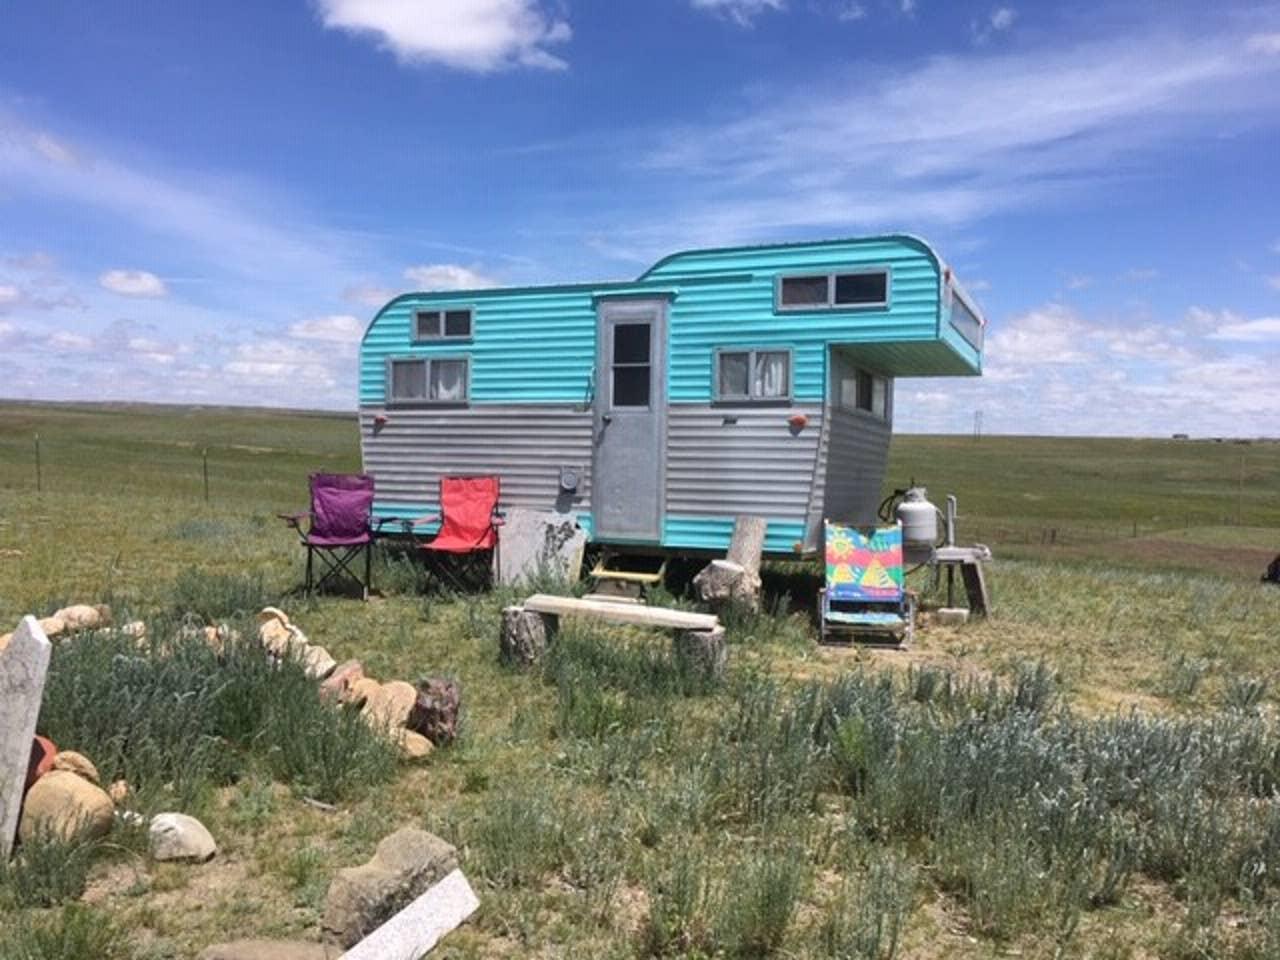 vintage-camping-air-bnb-buffalo-wy